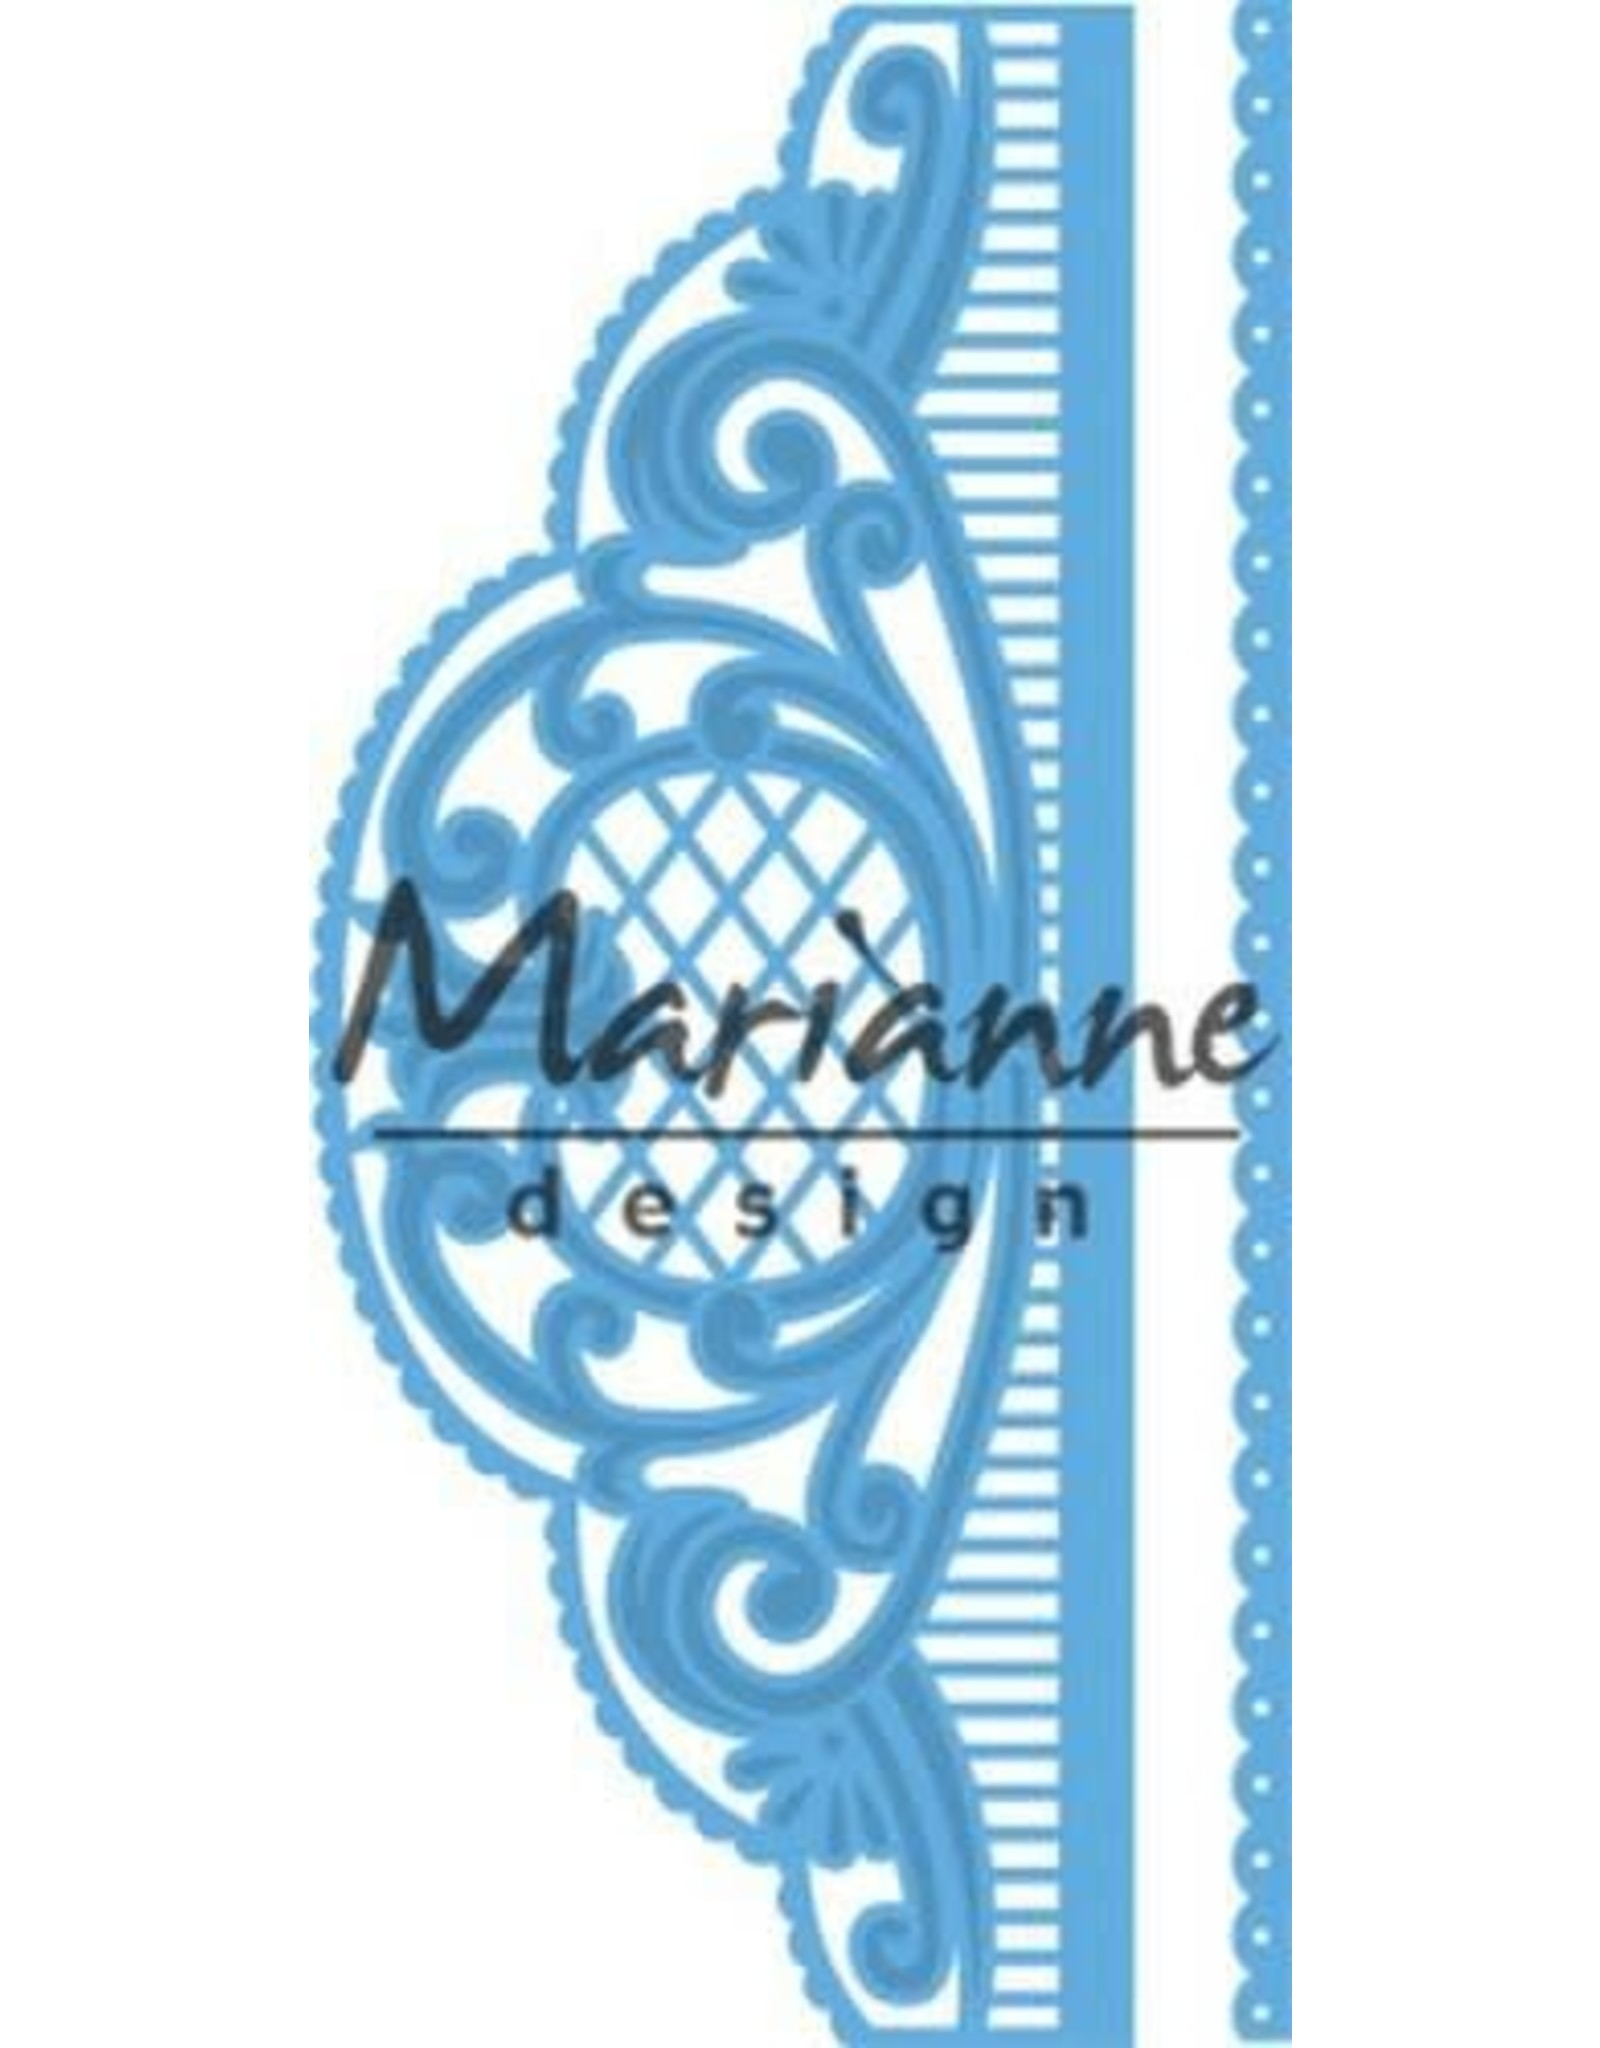 Marianne Design Marianne D Creatable Anja's border LR0525 3x135 - 51x135mm